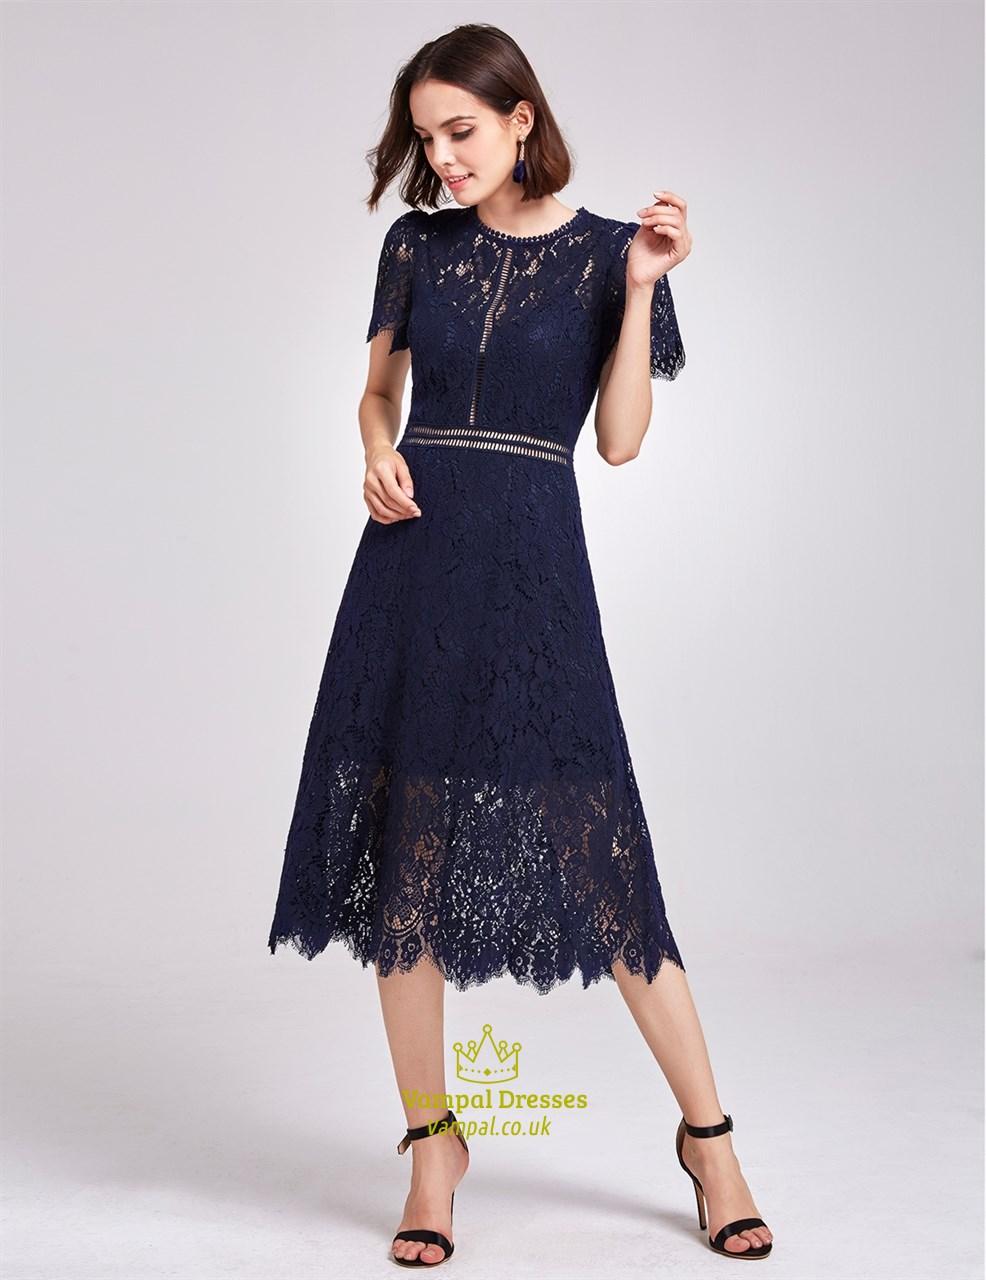 Tea Length Navy Blue Dresses